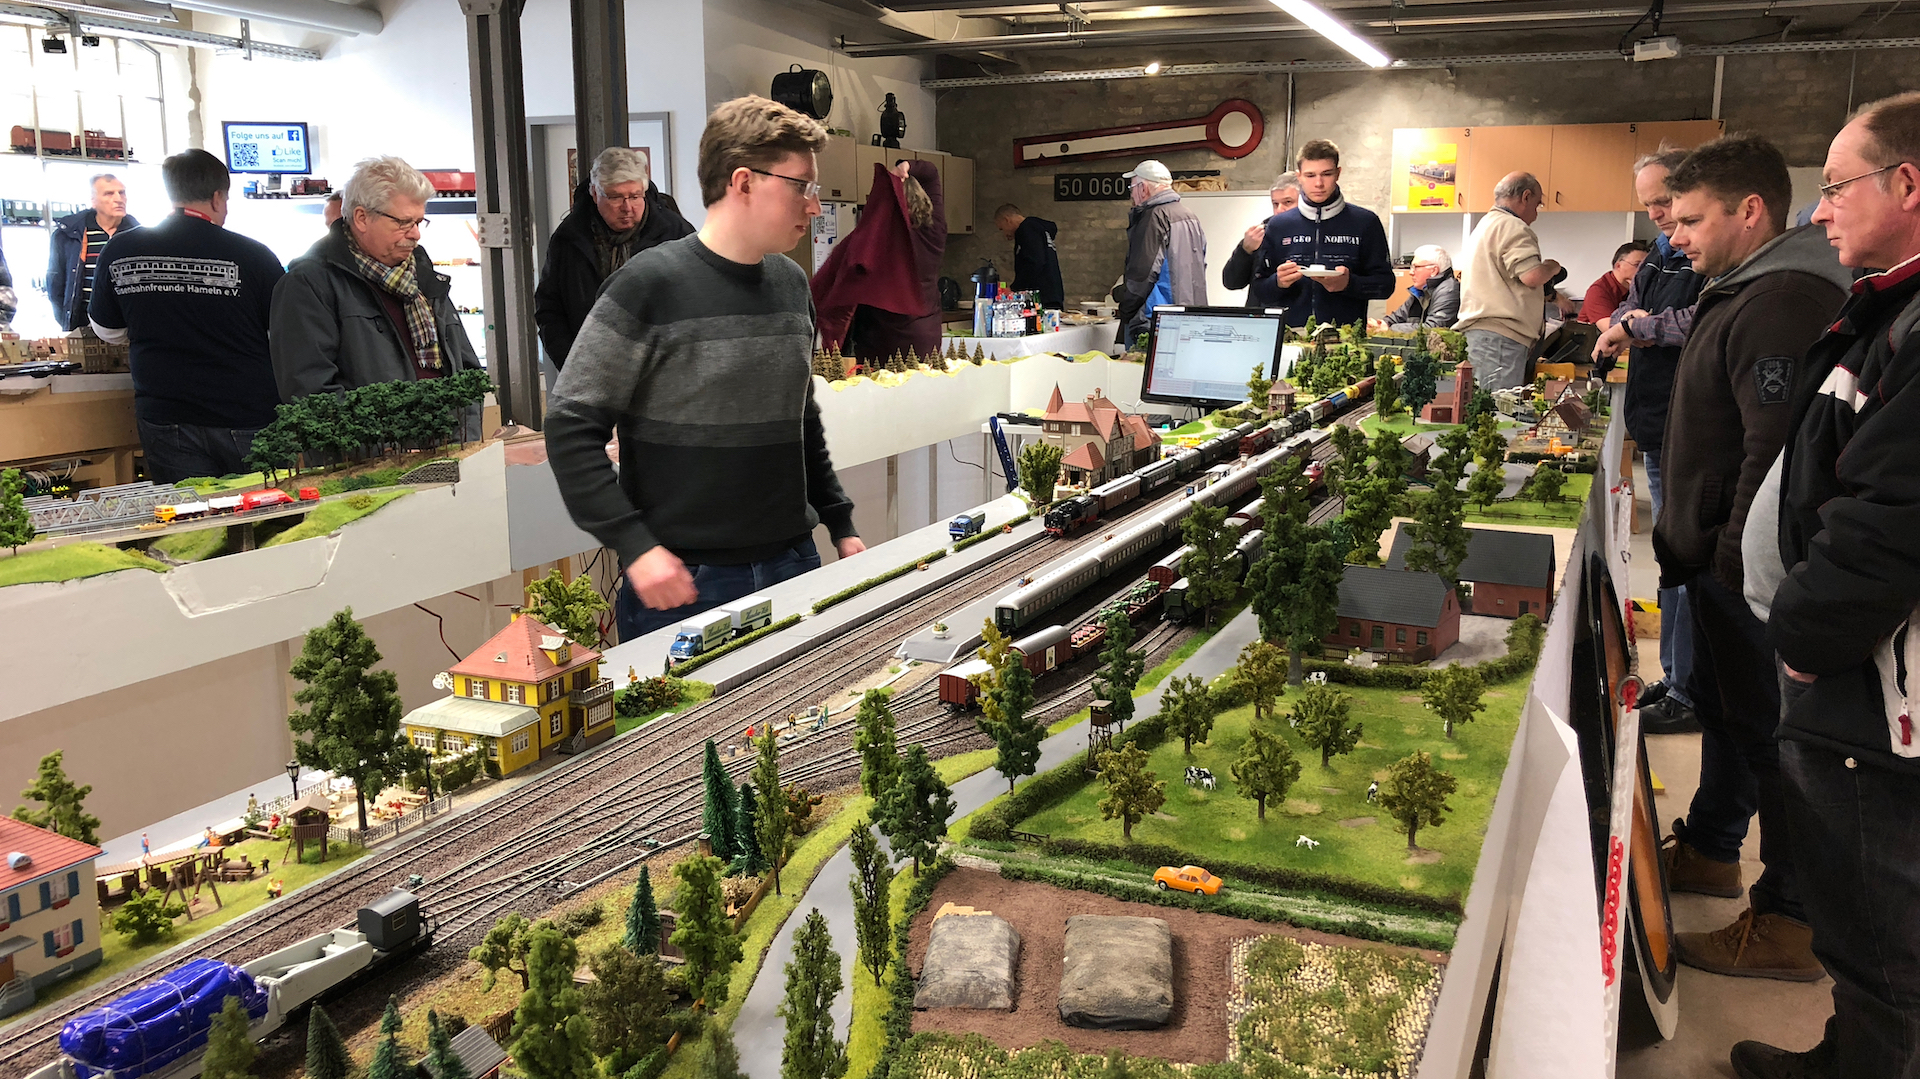 18_02_24_Schautag-Eisenbahnfreunde-Hameln_002